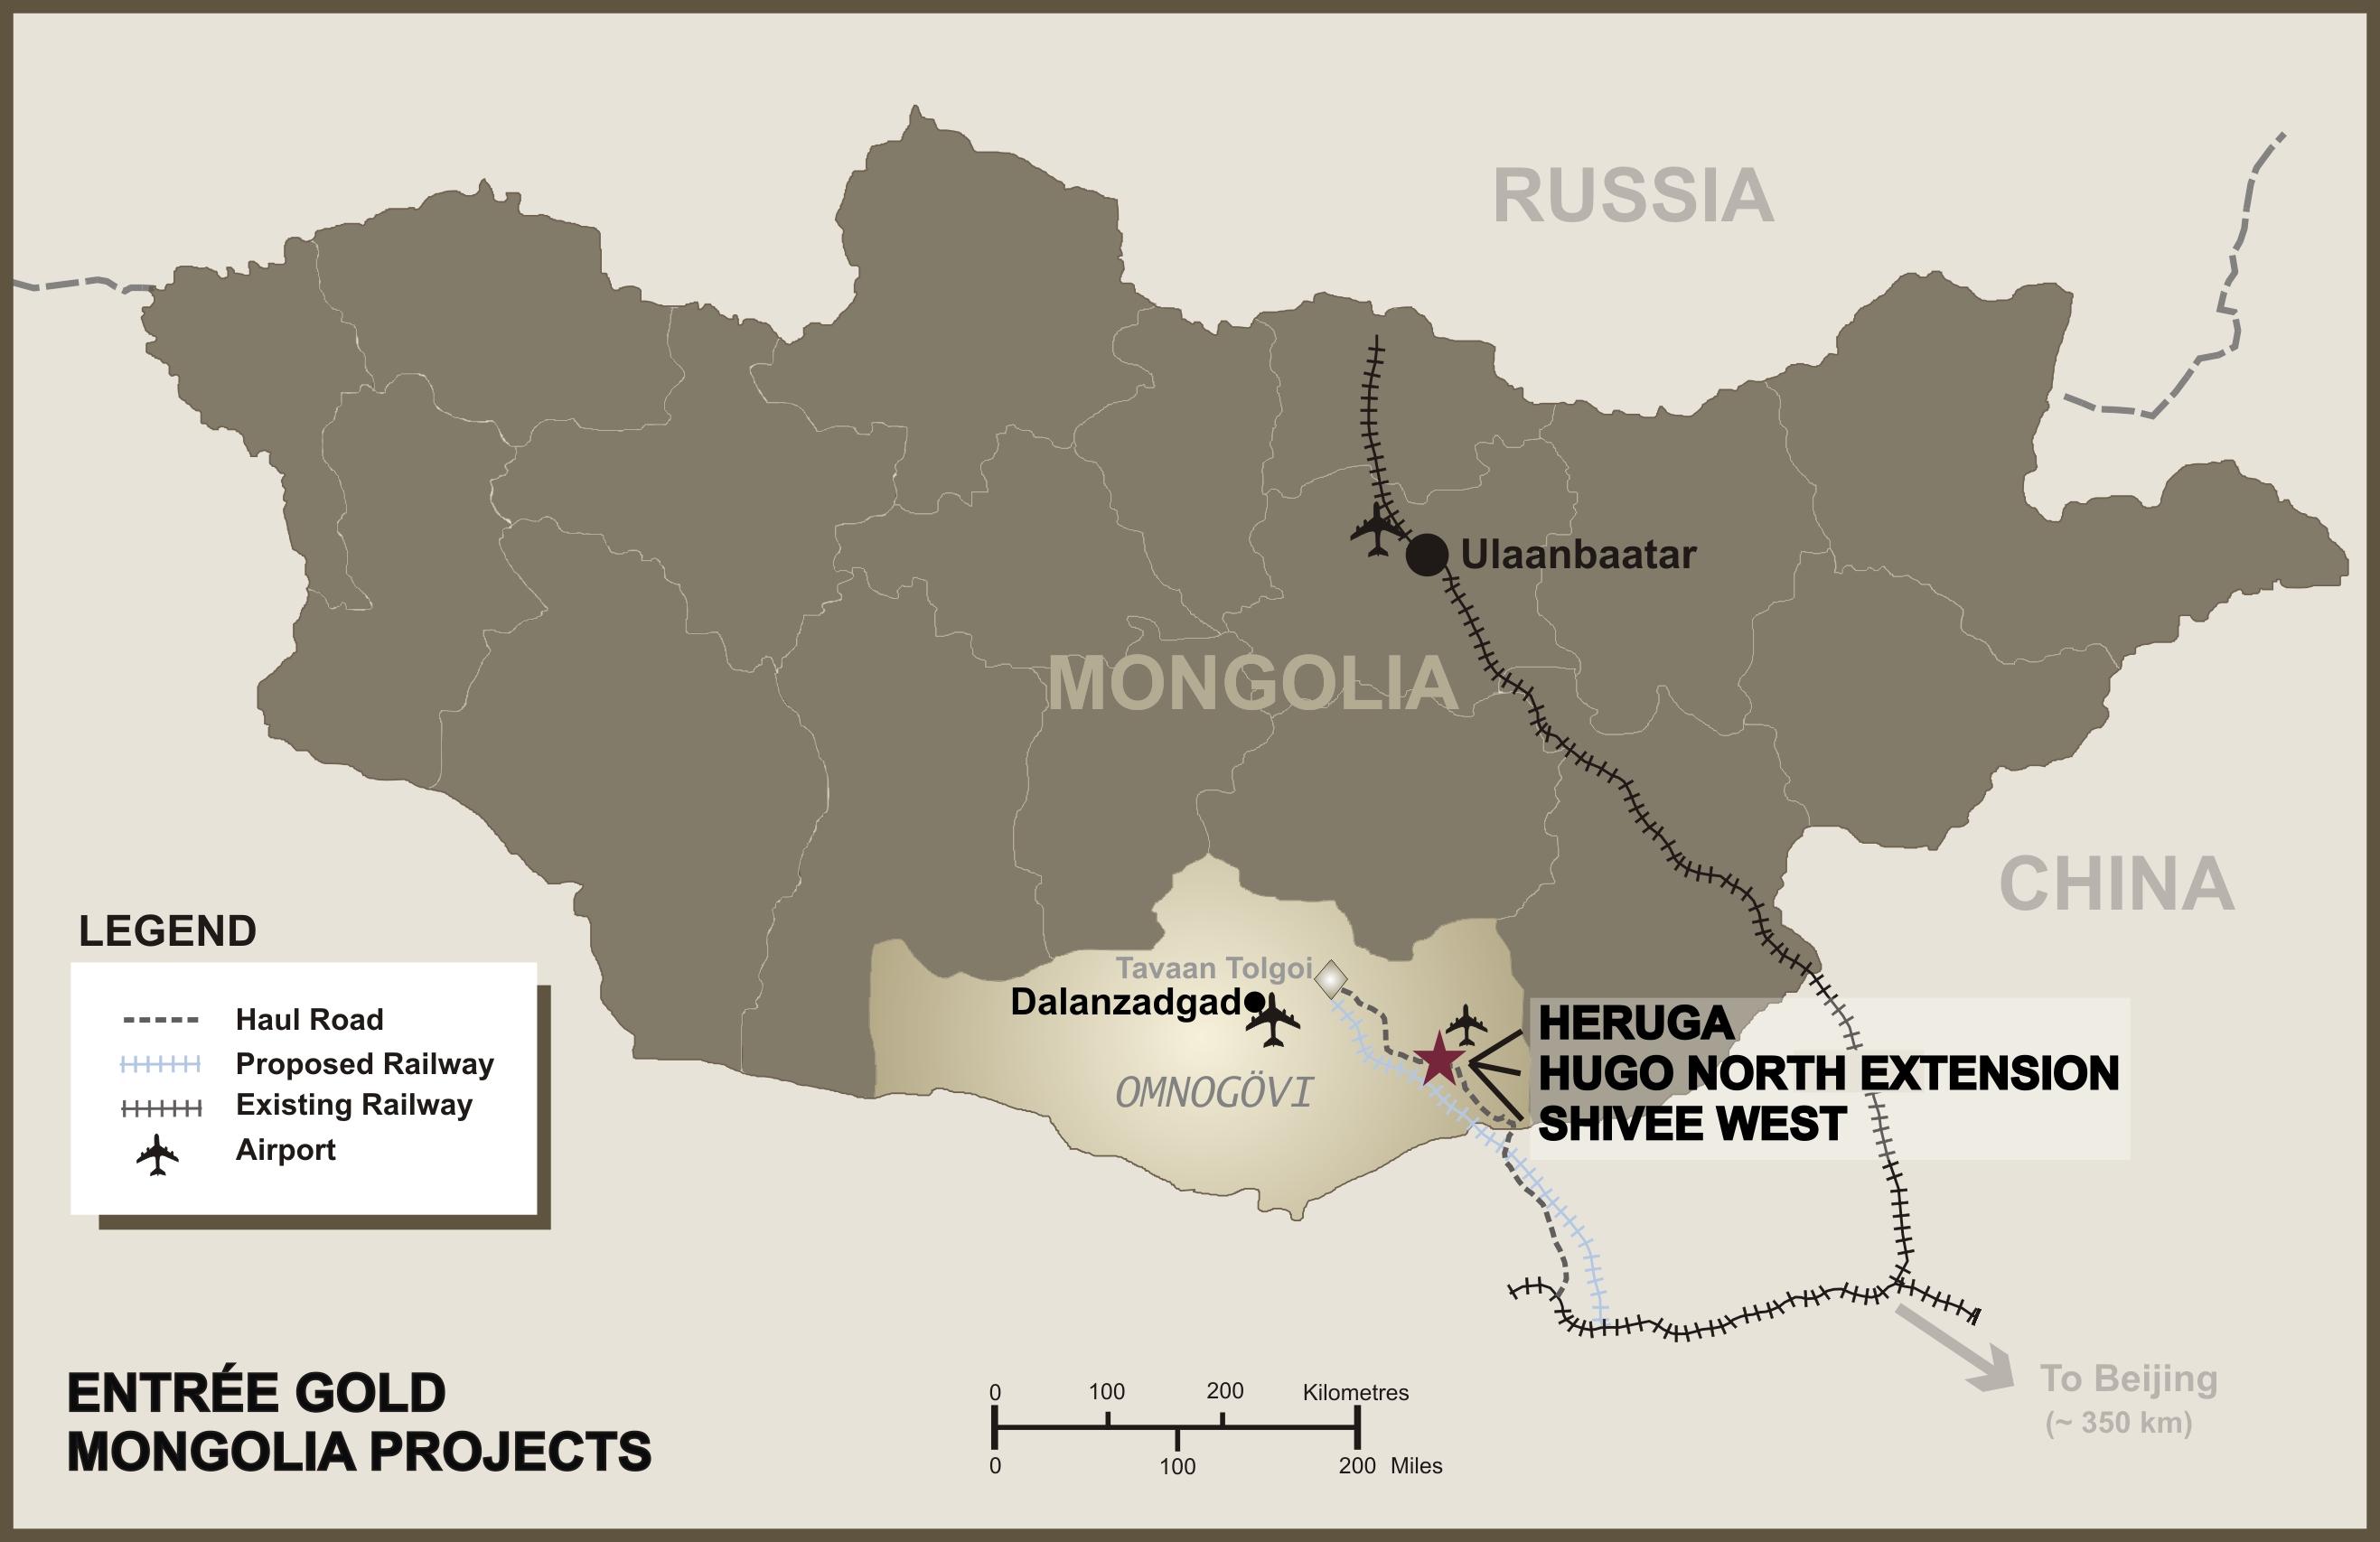 Proyectos de extracción de oro en Mongolia (Fuente: https://i2.wp.com/www.uuluurhai.mn/wp-content/uploads/2013/03/mongolia_country_map_november2011.jpg)